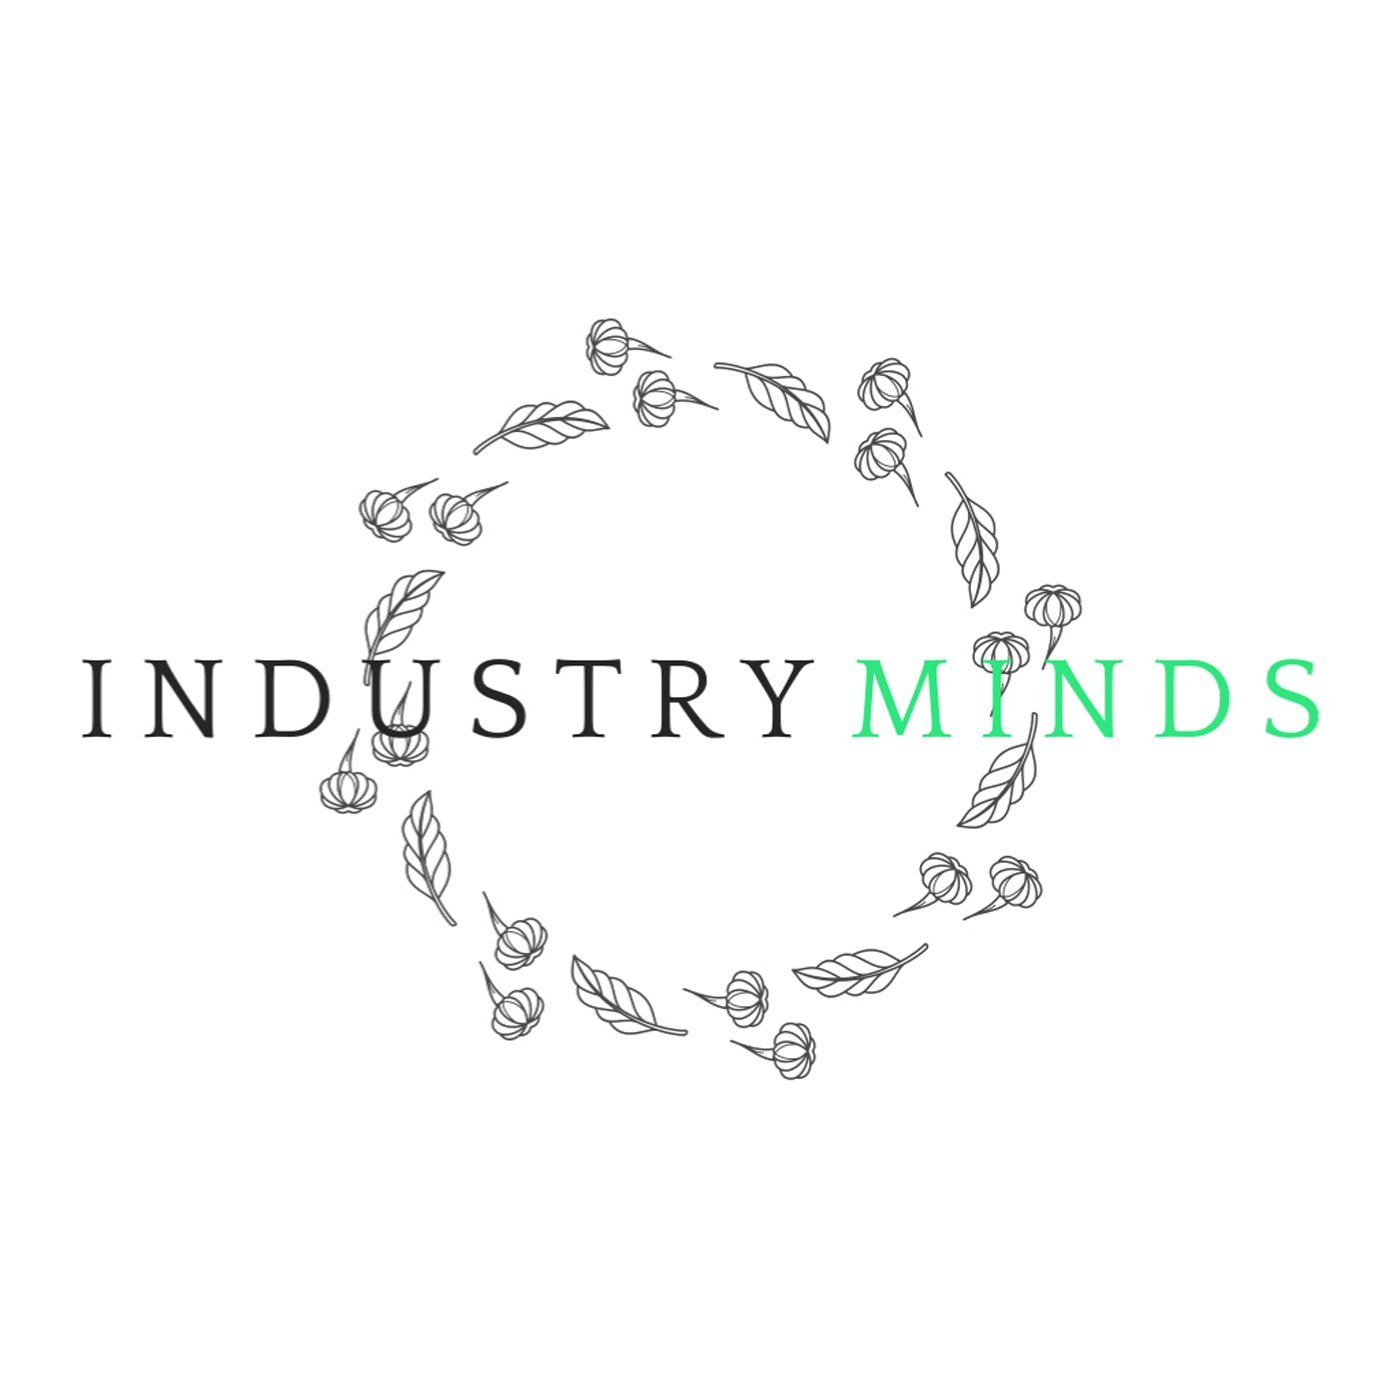 Industry Minds logo